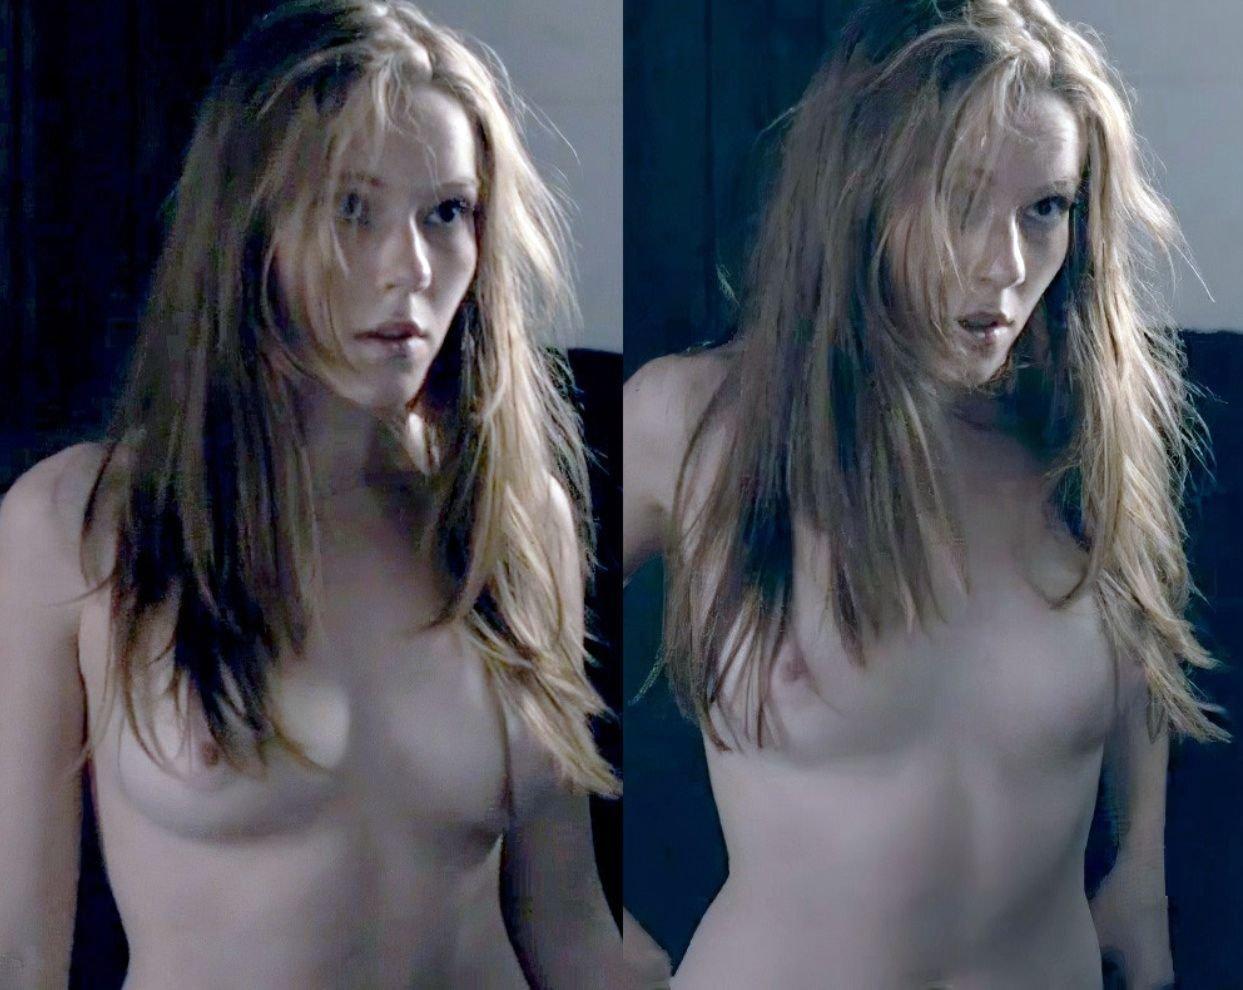 Amature irish nude women